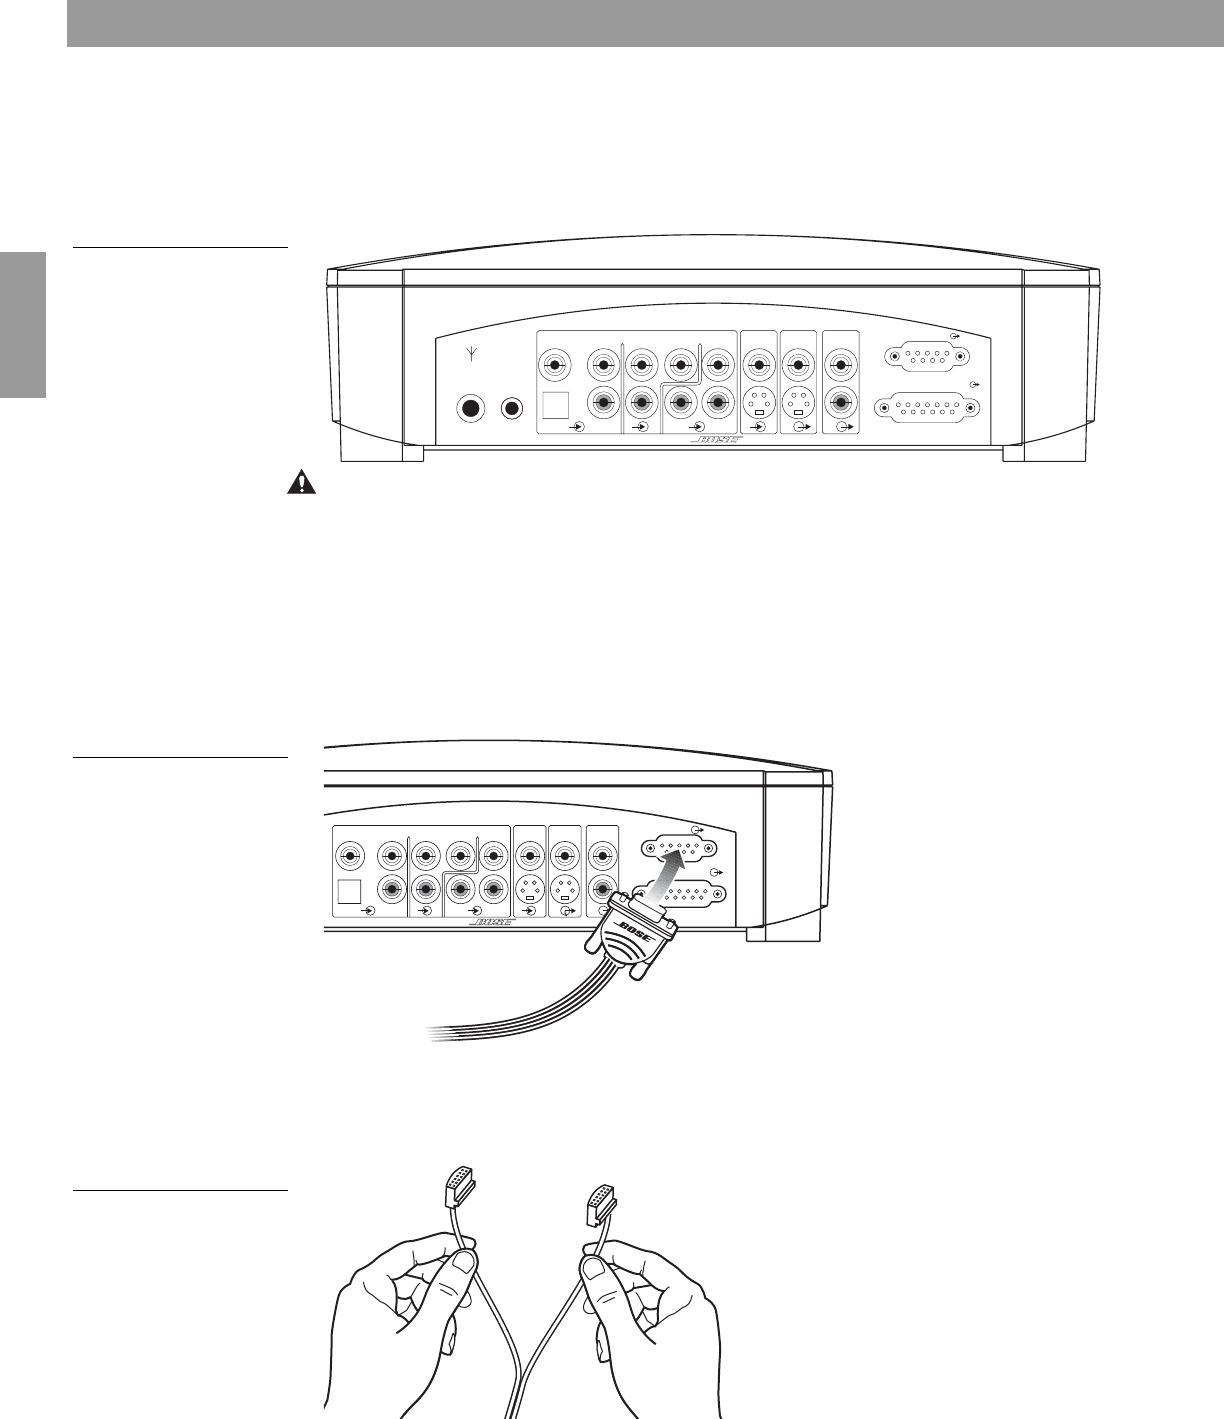 Handleiding Bose 321 GS serie 1 (pagina 14 van 64) (Deutsch)